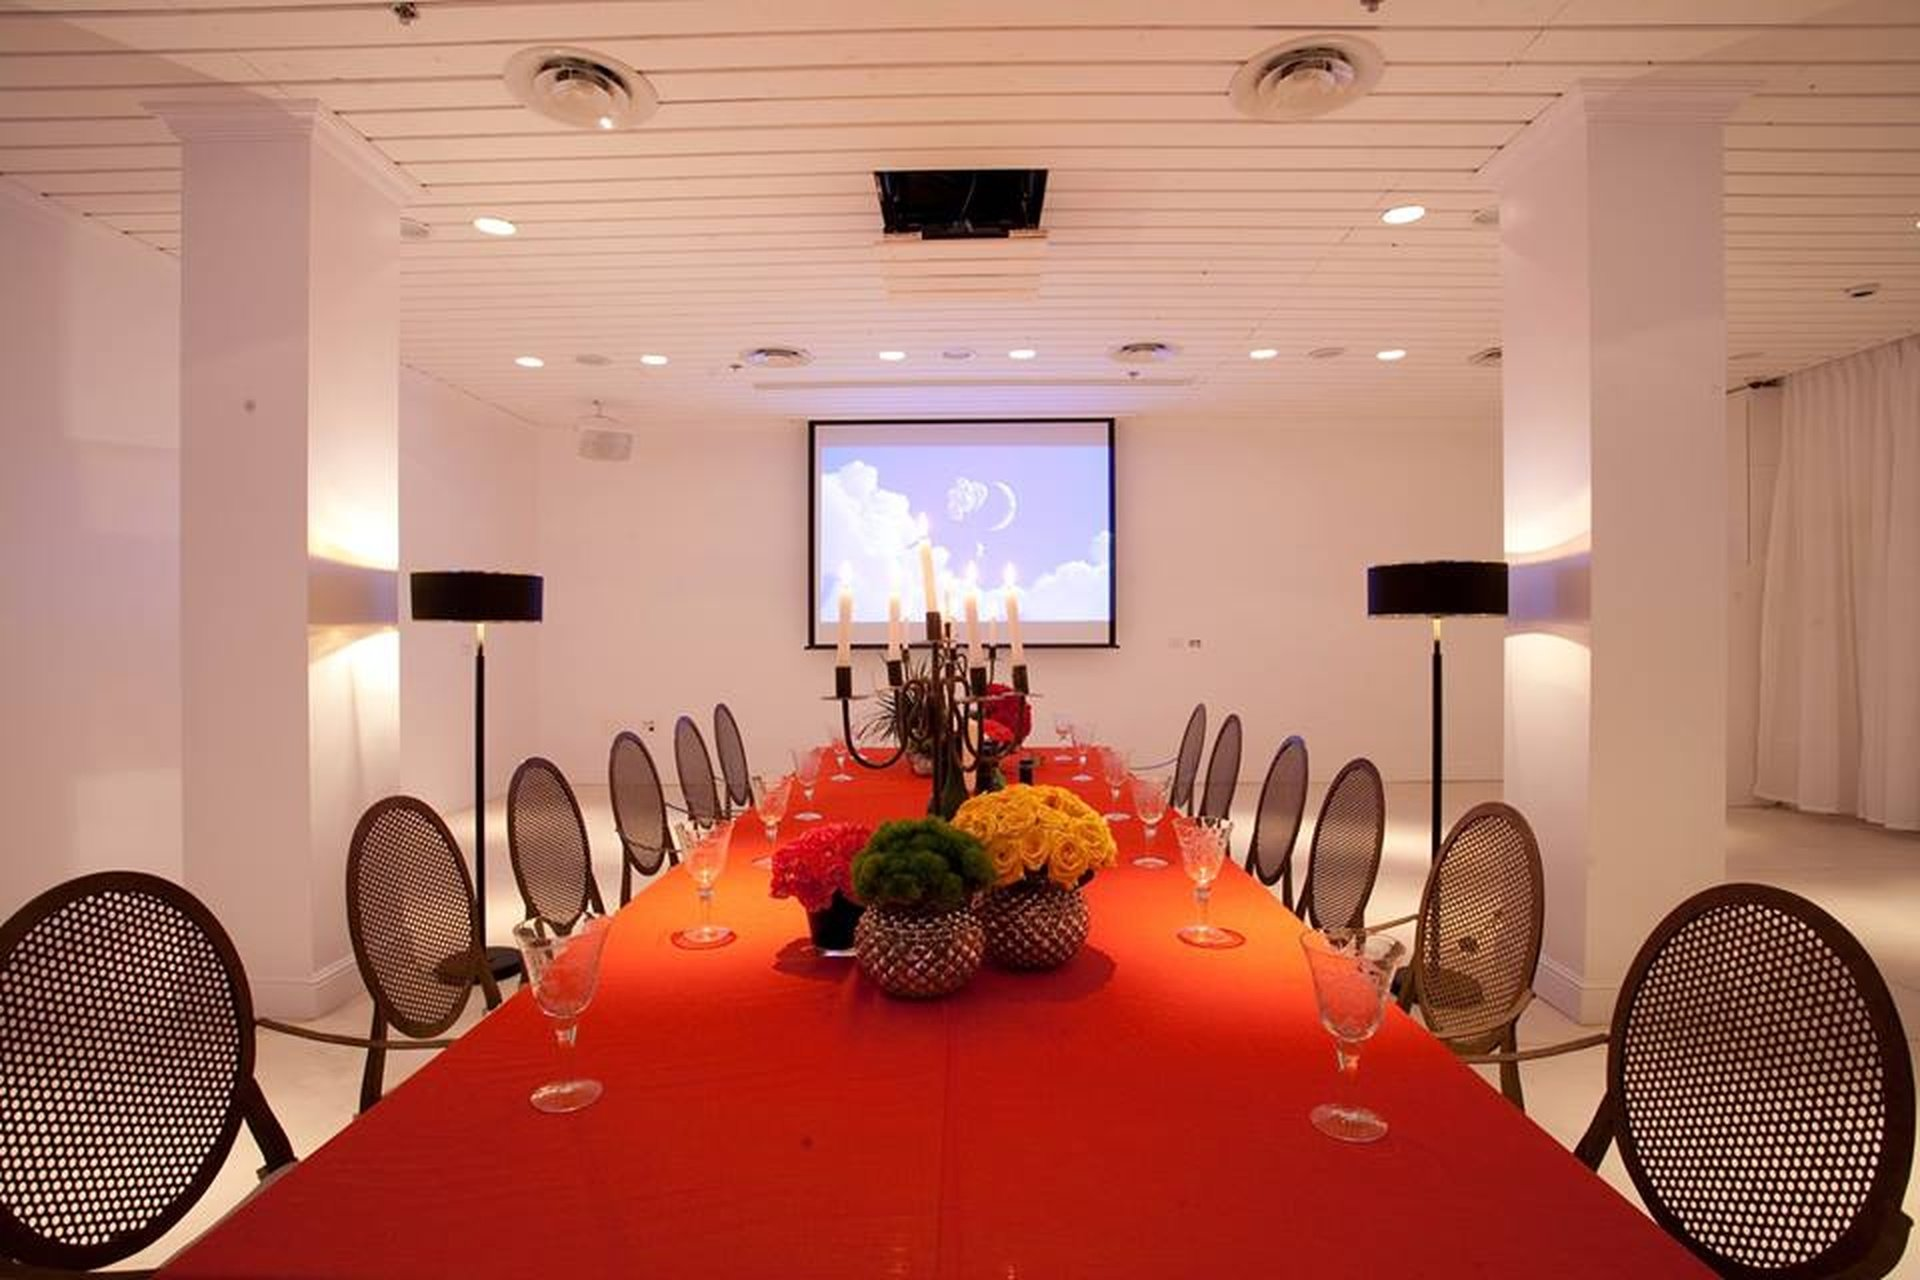 Tel Aviv seminar rooms Partyraum Mandarin image 0